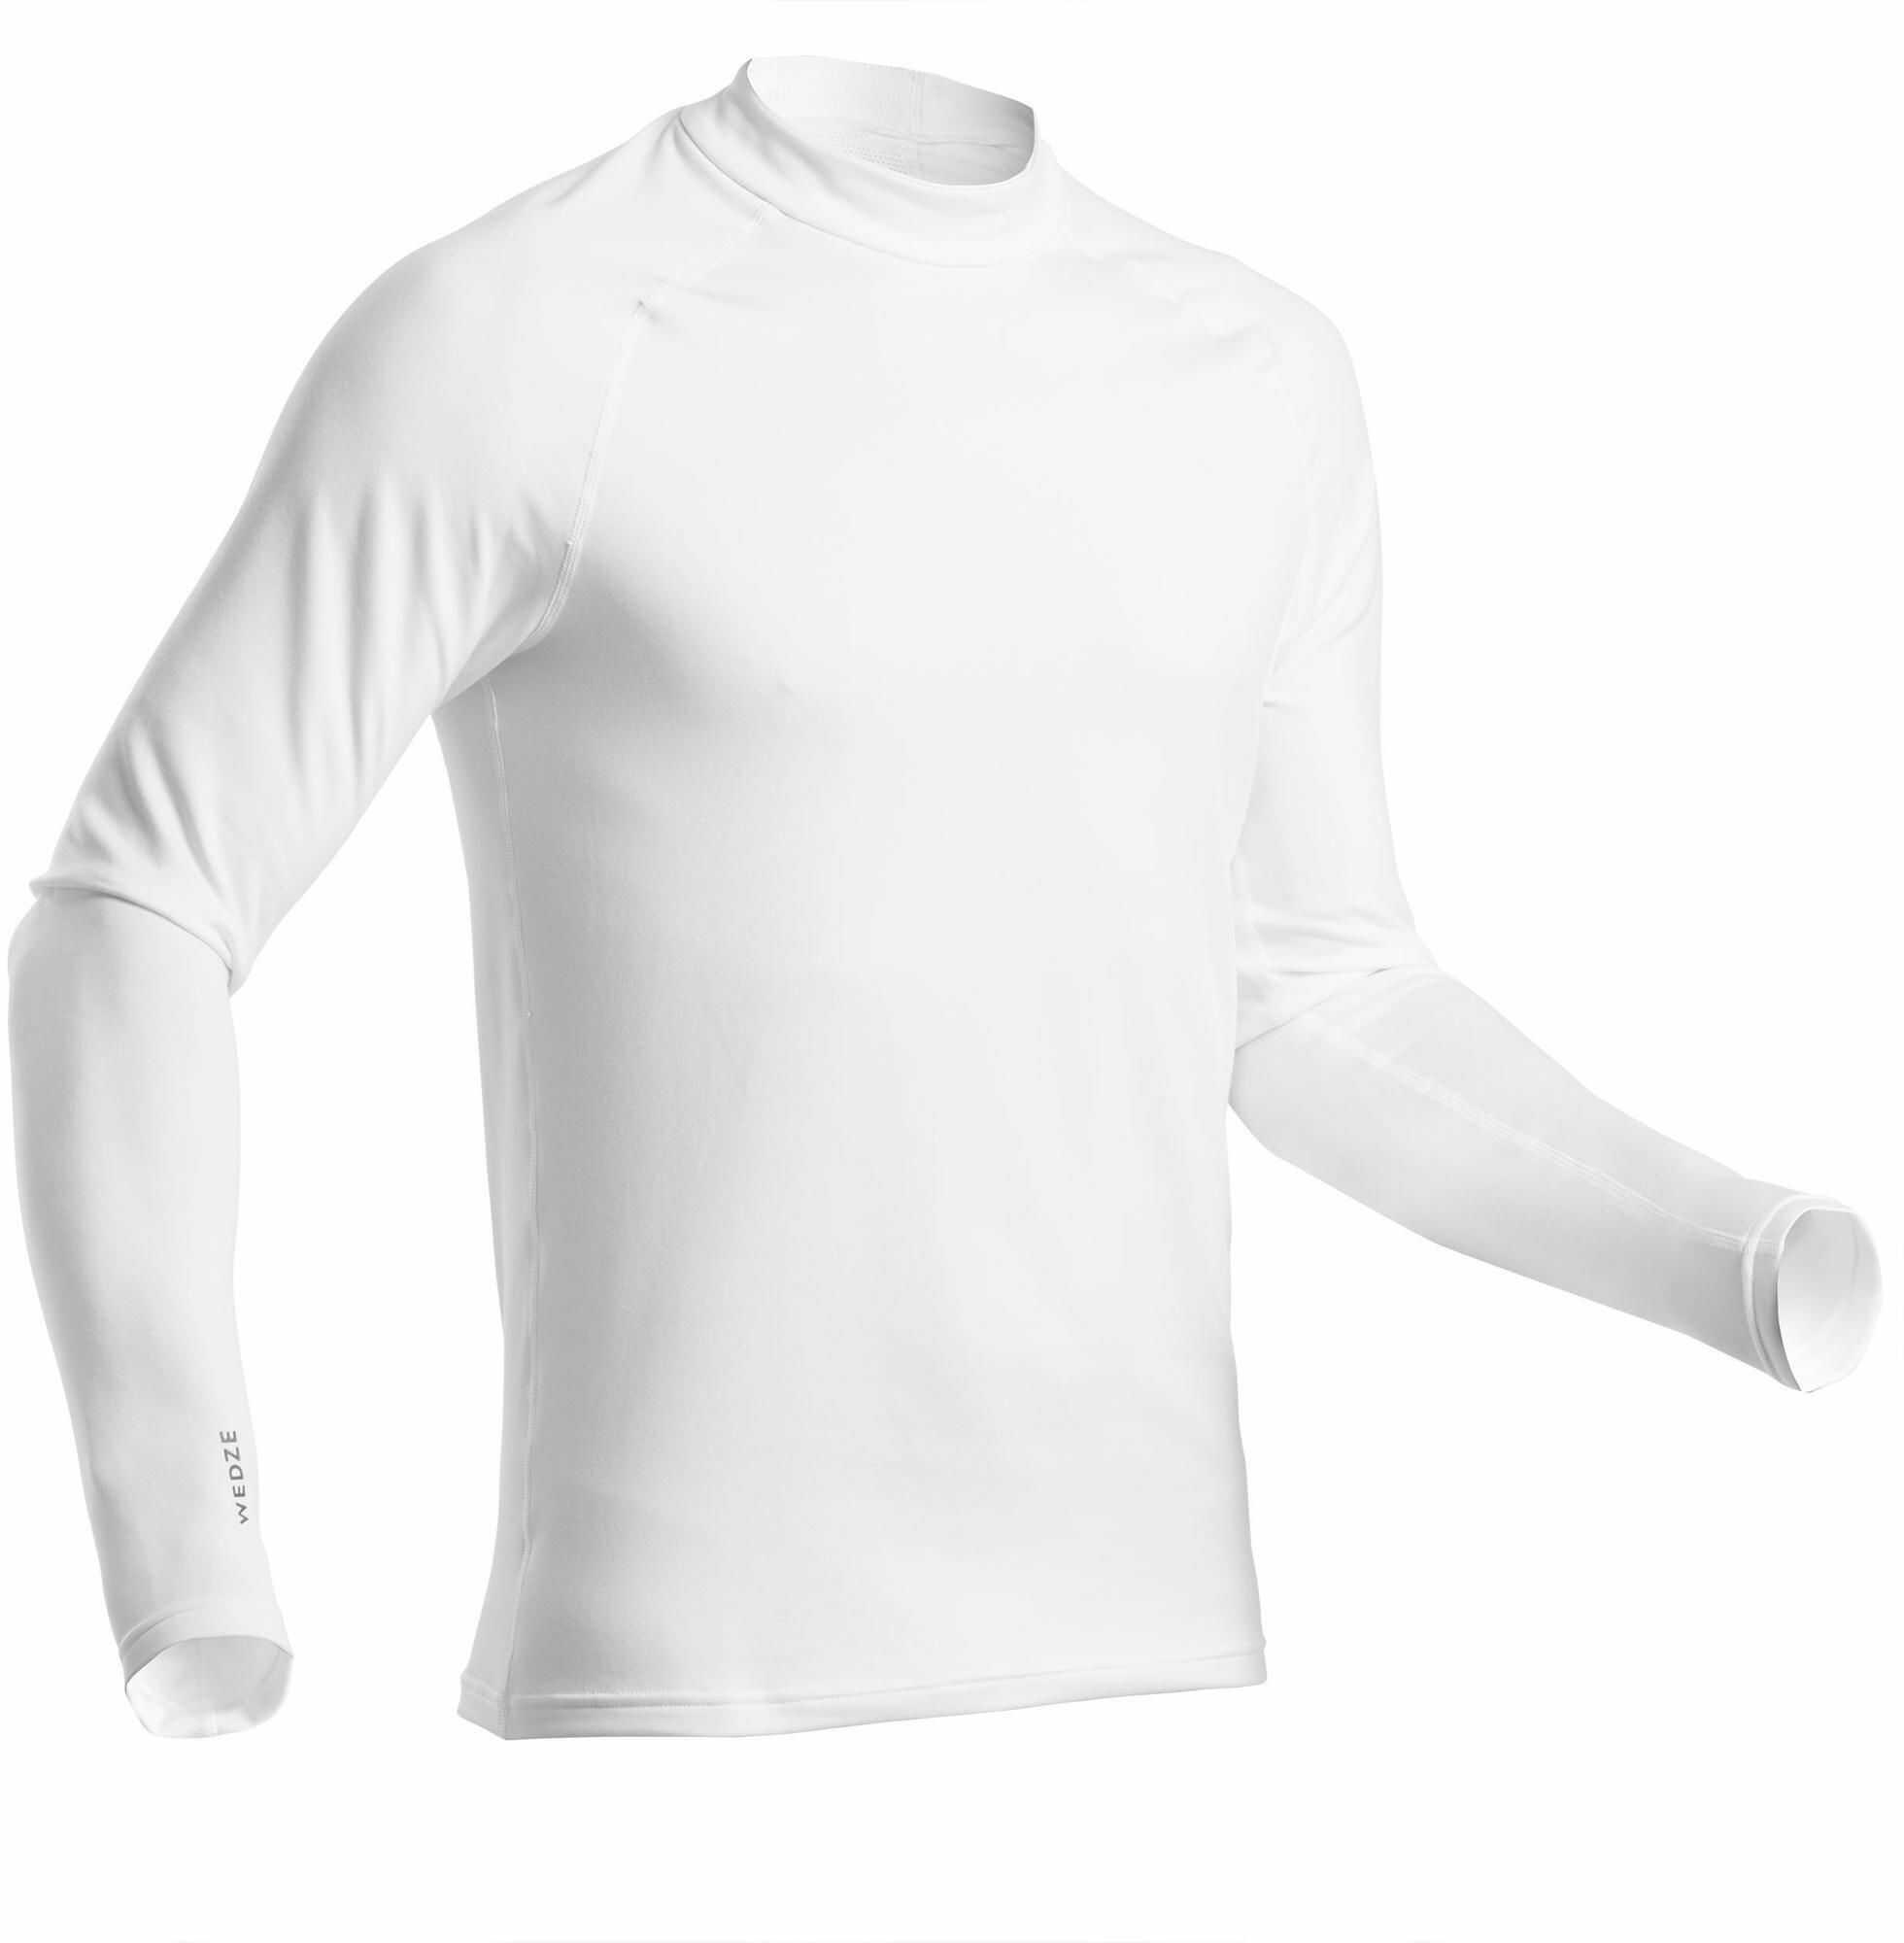 Koszulka narciarska 500 męska